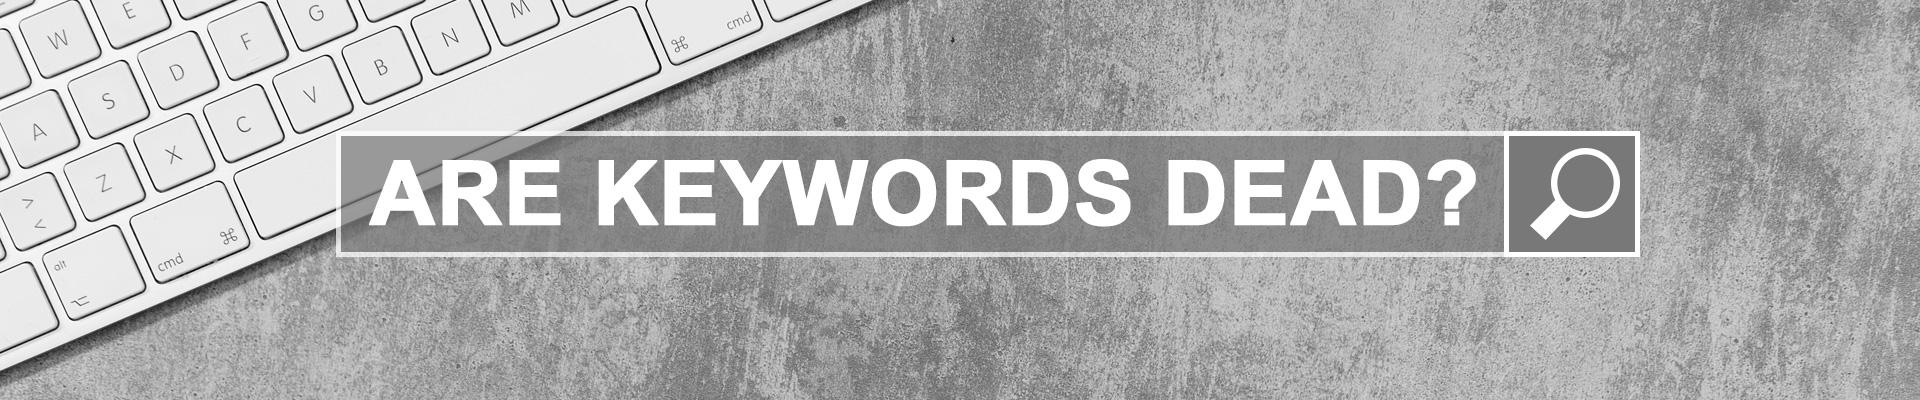 Are Keywords Dead?